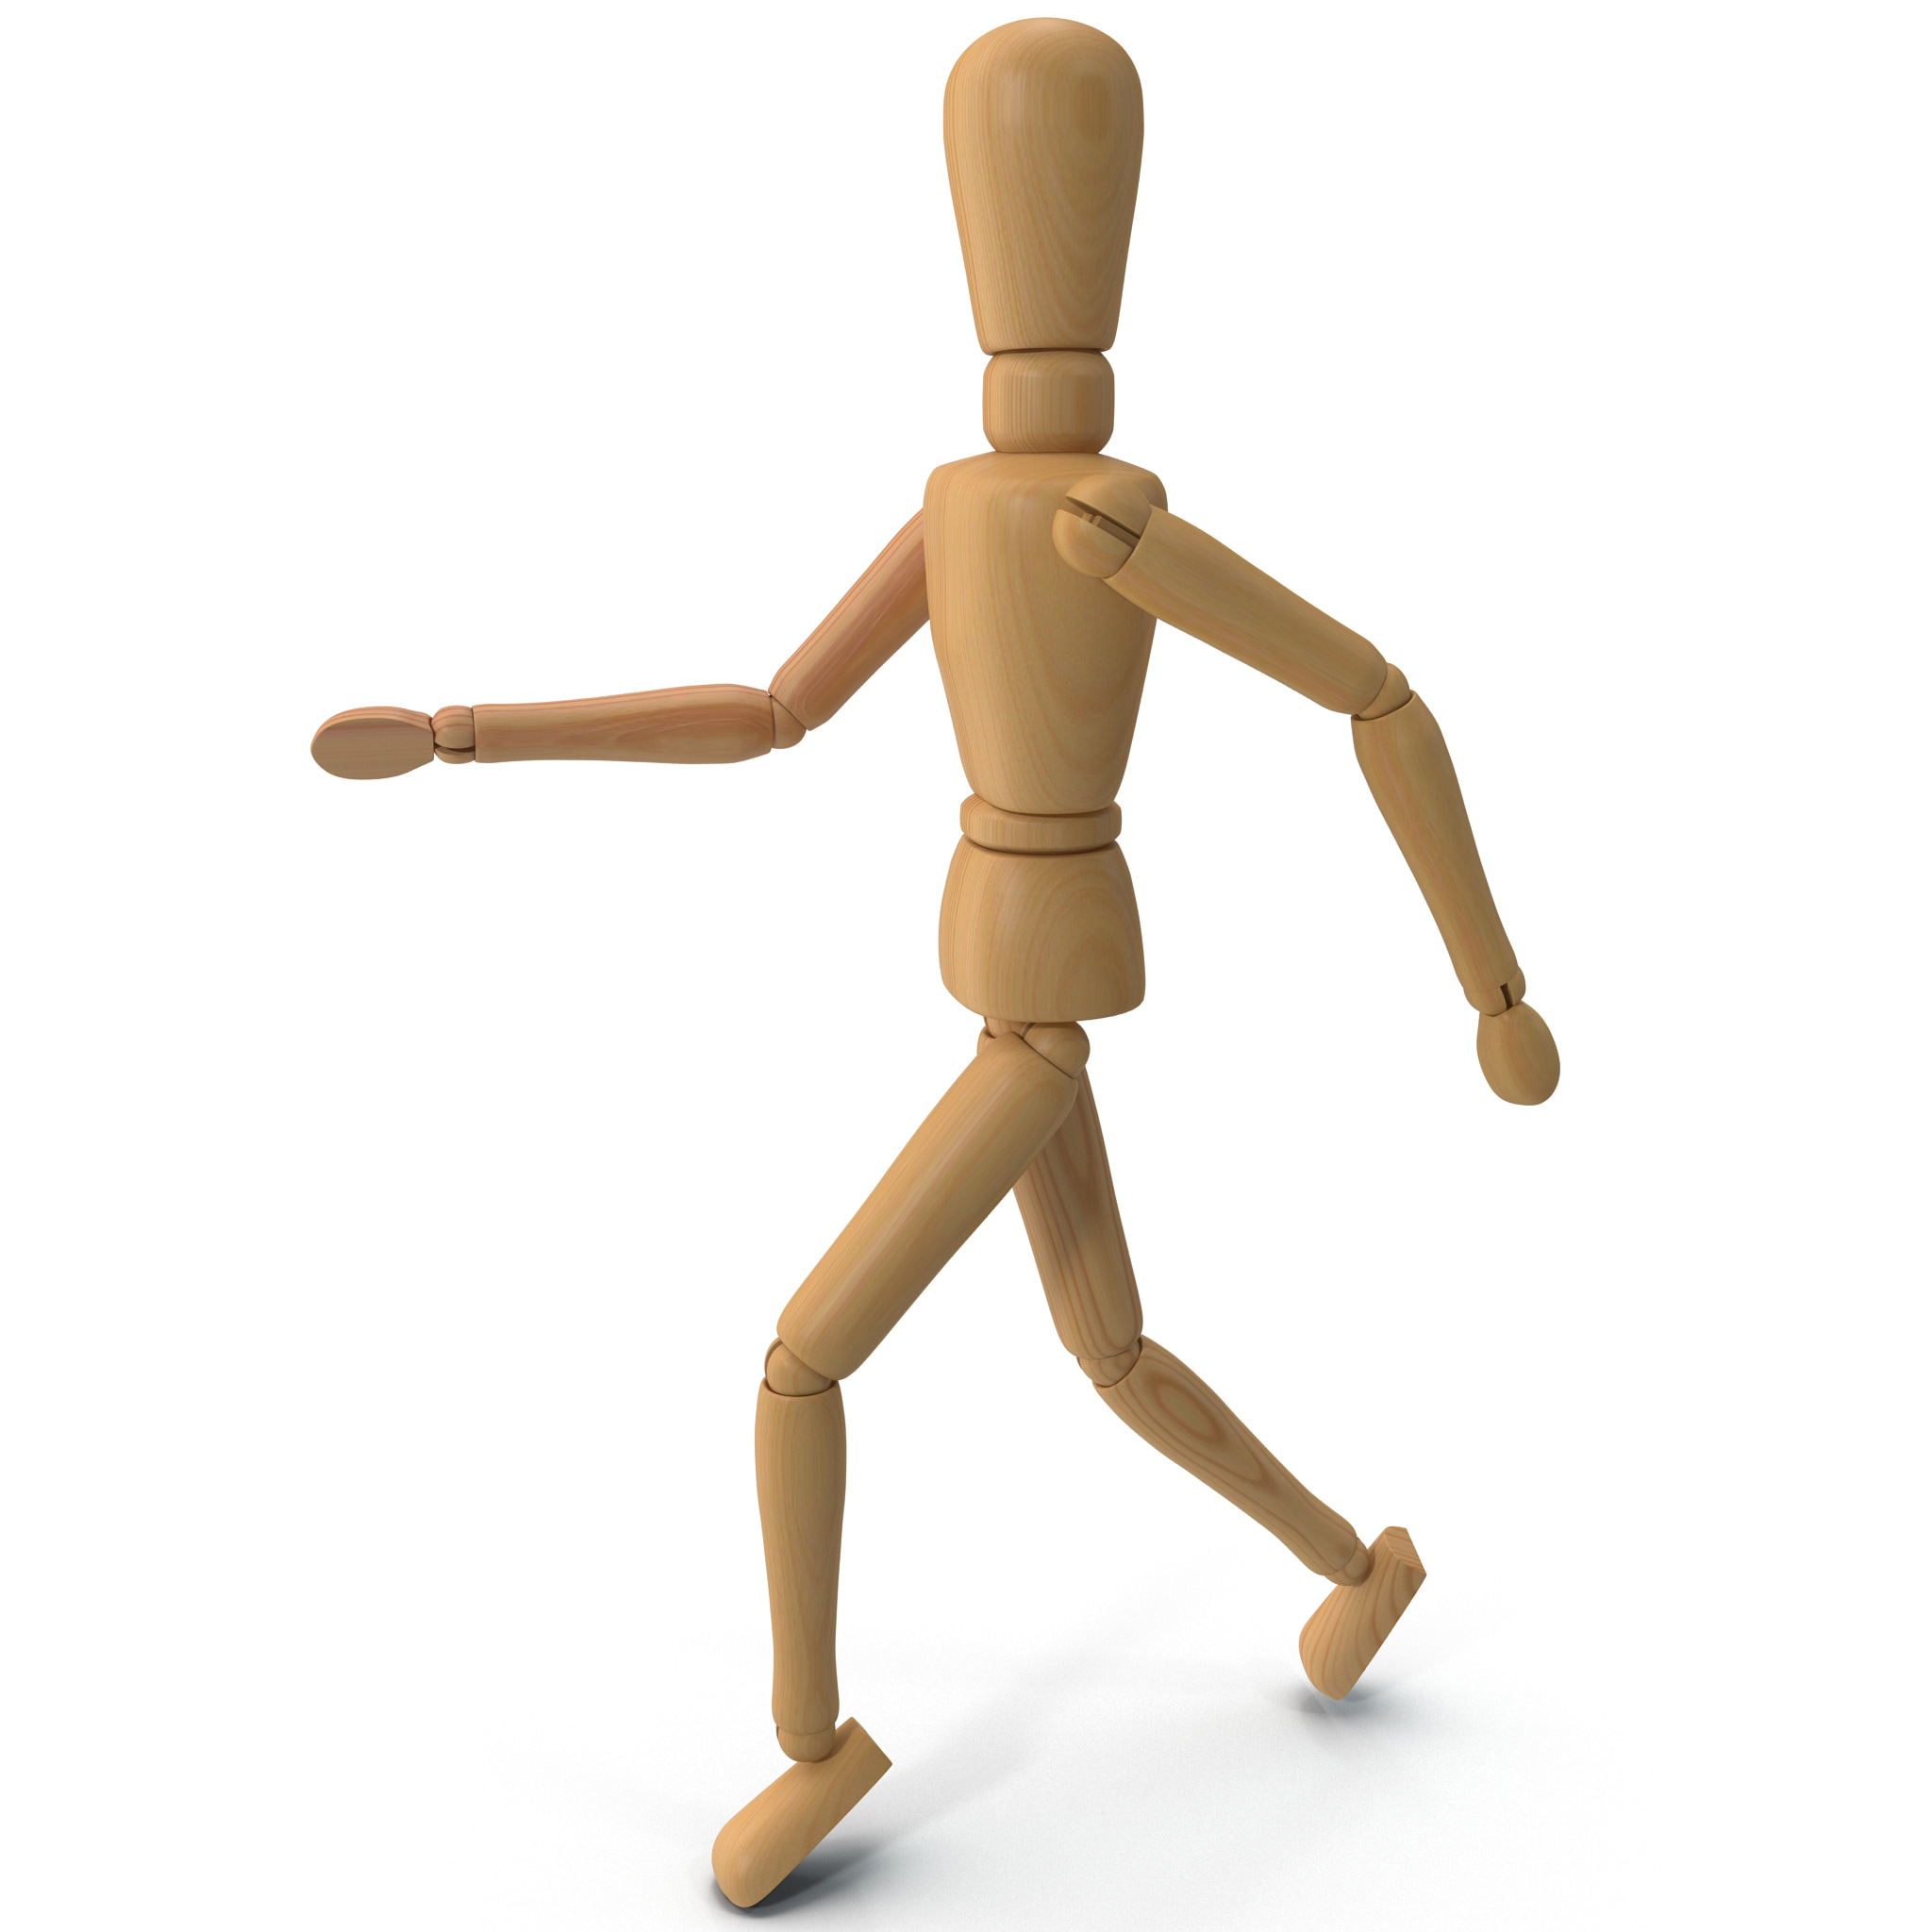 3d model wooden mannequin running